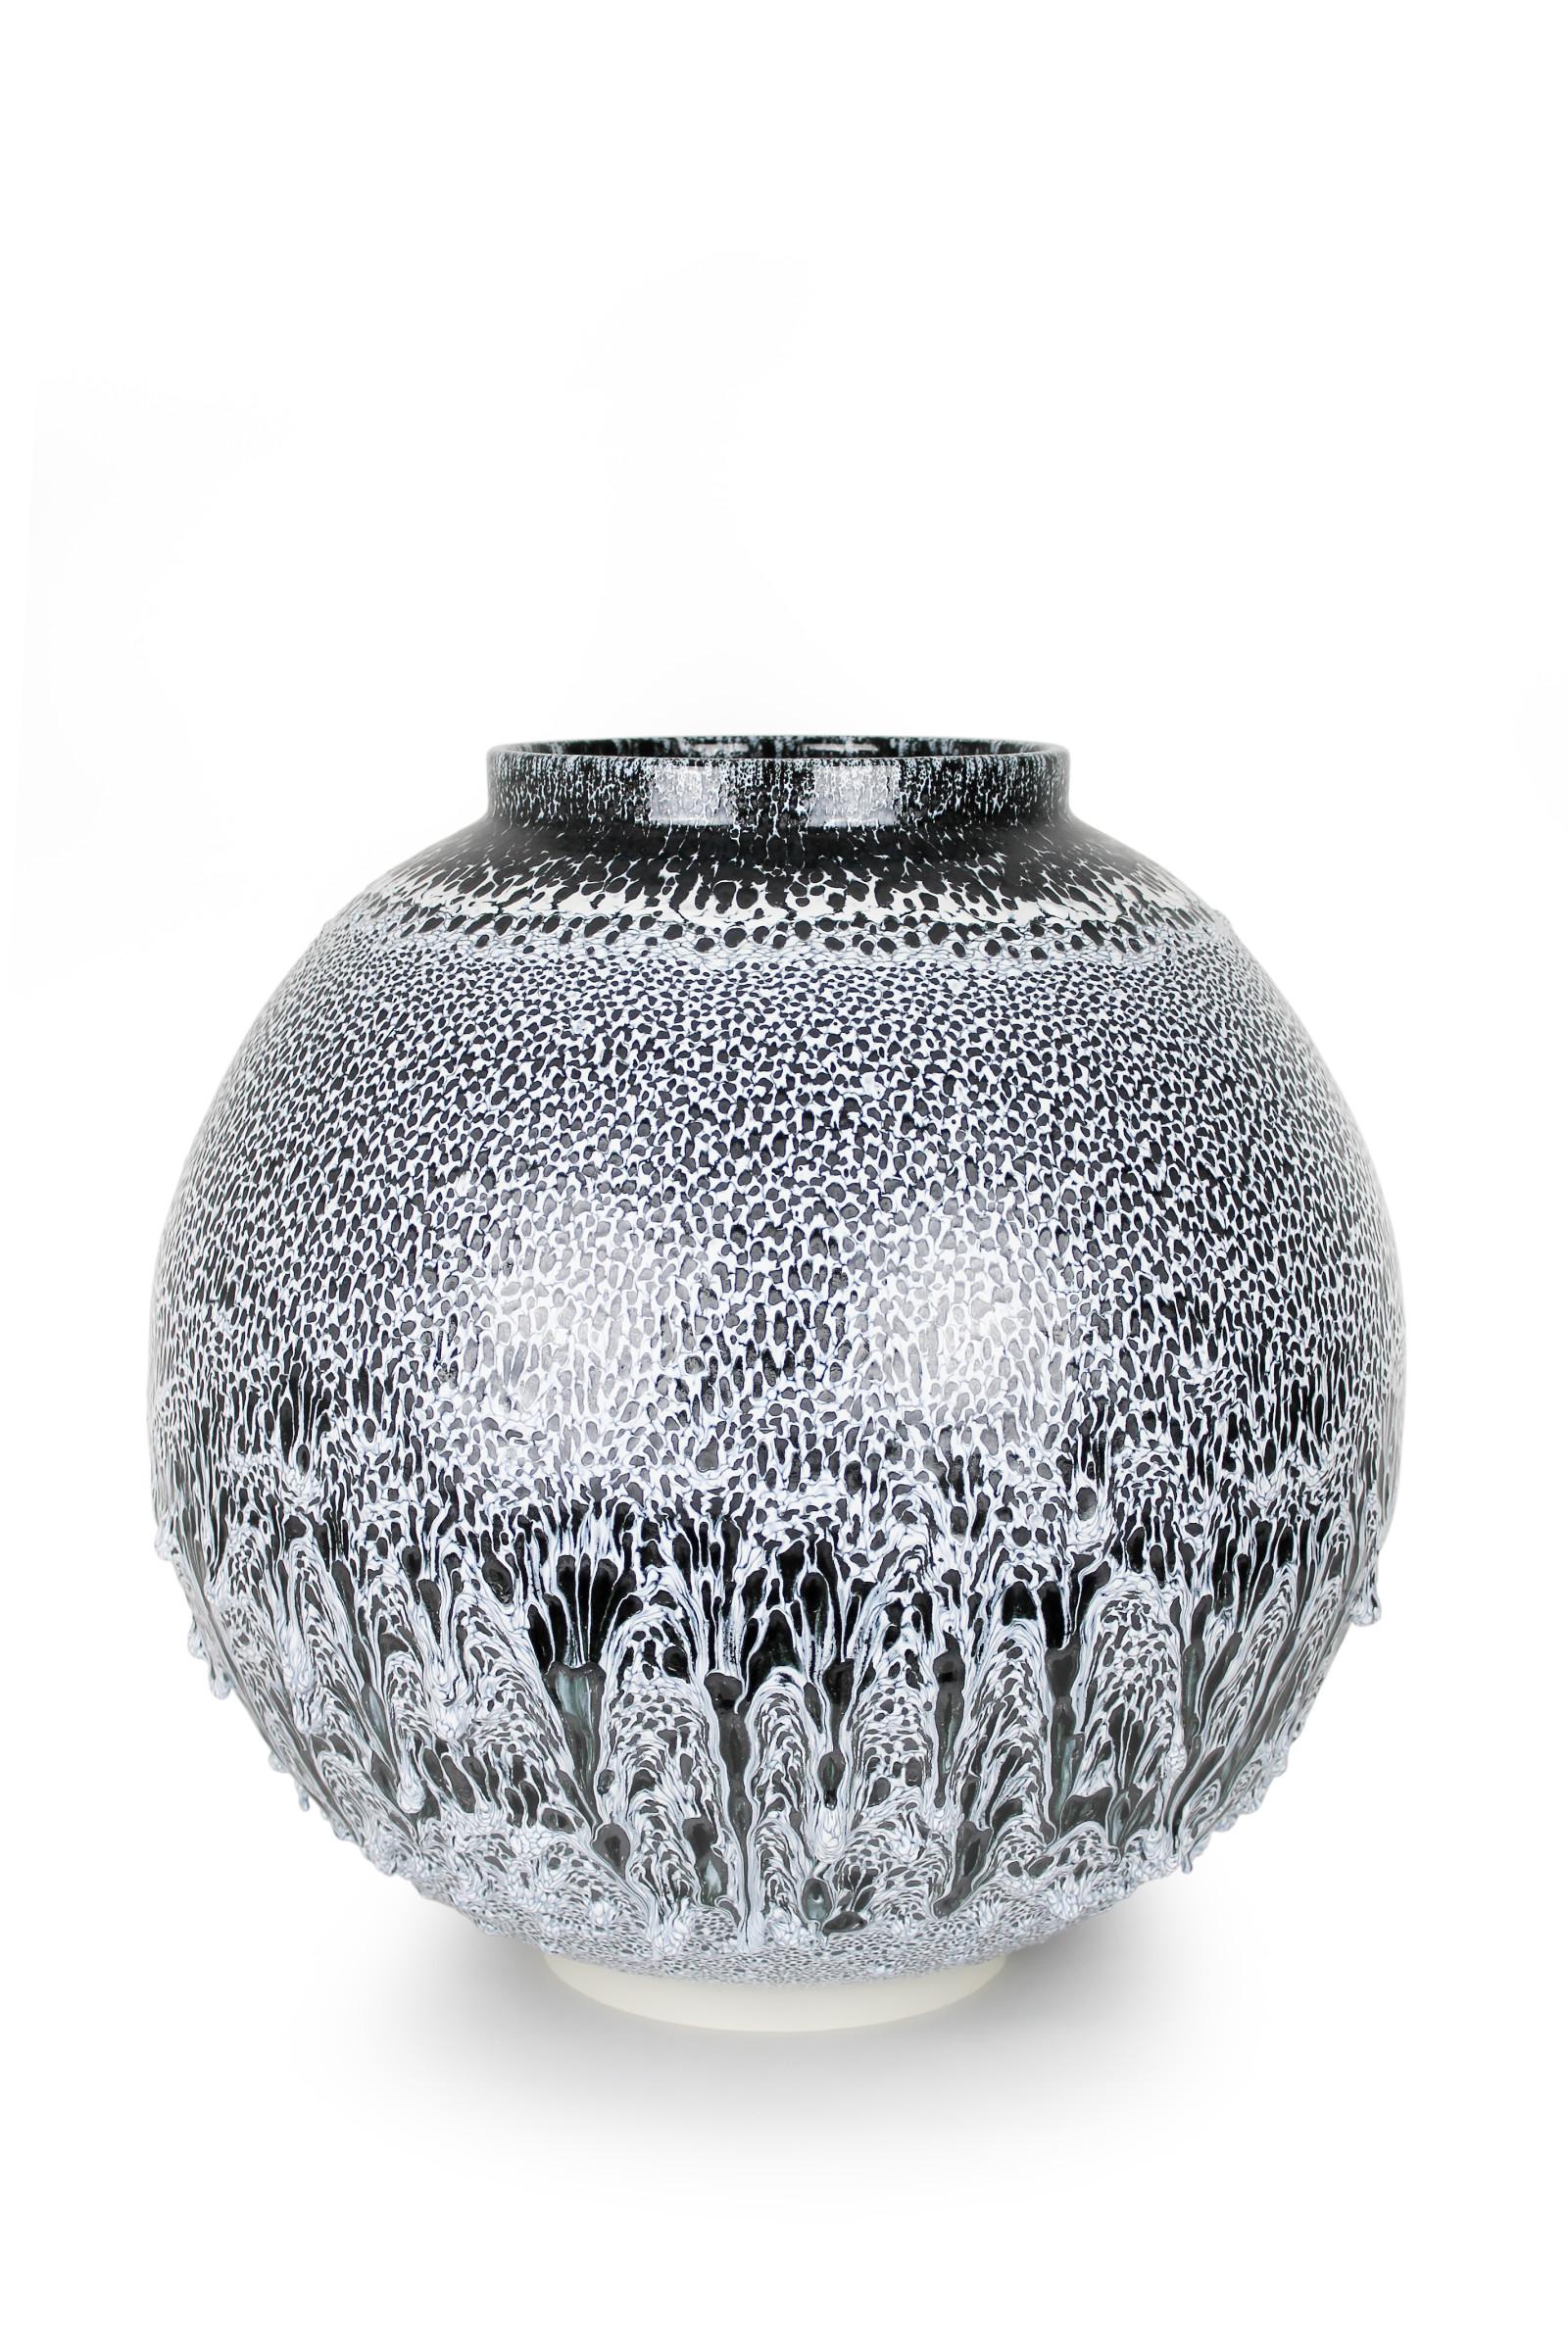 "<span class=""link fancybox-details-link""><a href=""/exhibitions/45/works/artworks2918/"">View Detail Page</a></span><div class=""artist""><strong>Albert Montserrat</strong></div><div class=""title""><em>Winter Jar</em>, 2019</div><div class=""medium"">Thrown and Glazed Porcelain</div><div class=""dimensions"">49 x 51 x 51 cm<br>19 1/4 x 20 1/8 x 20 1/8 in.</div>"